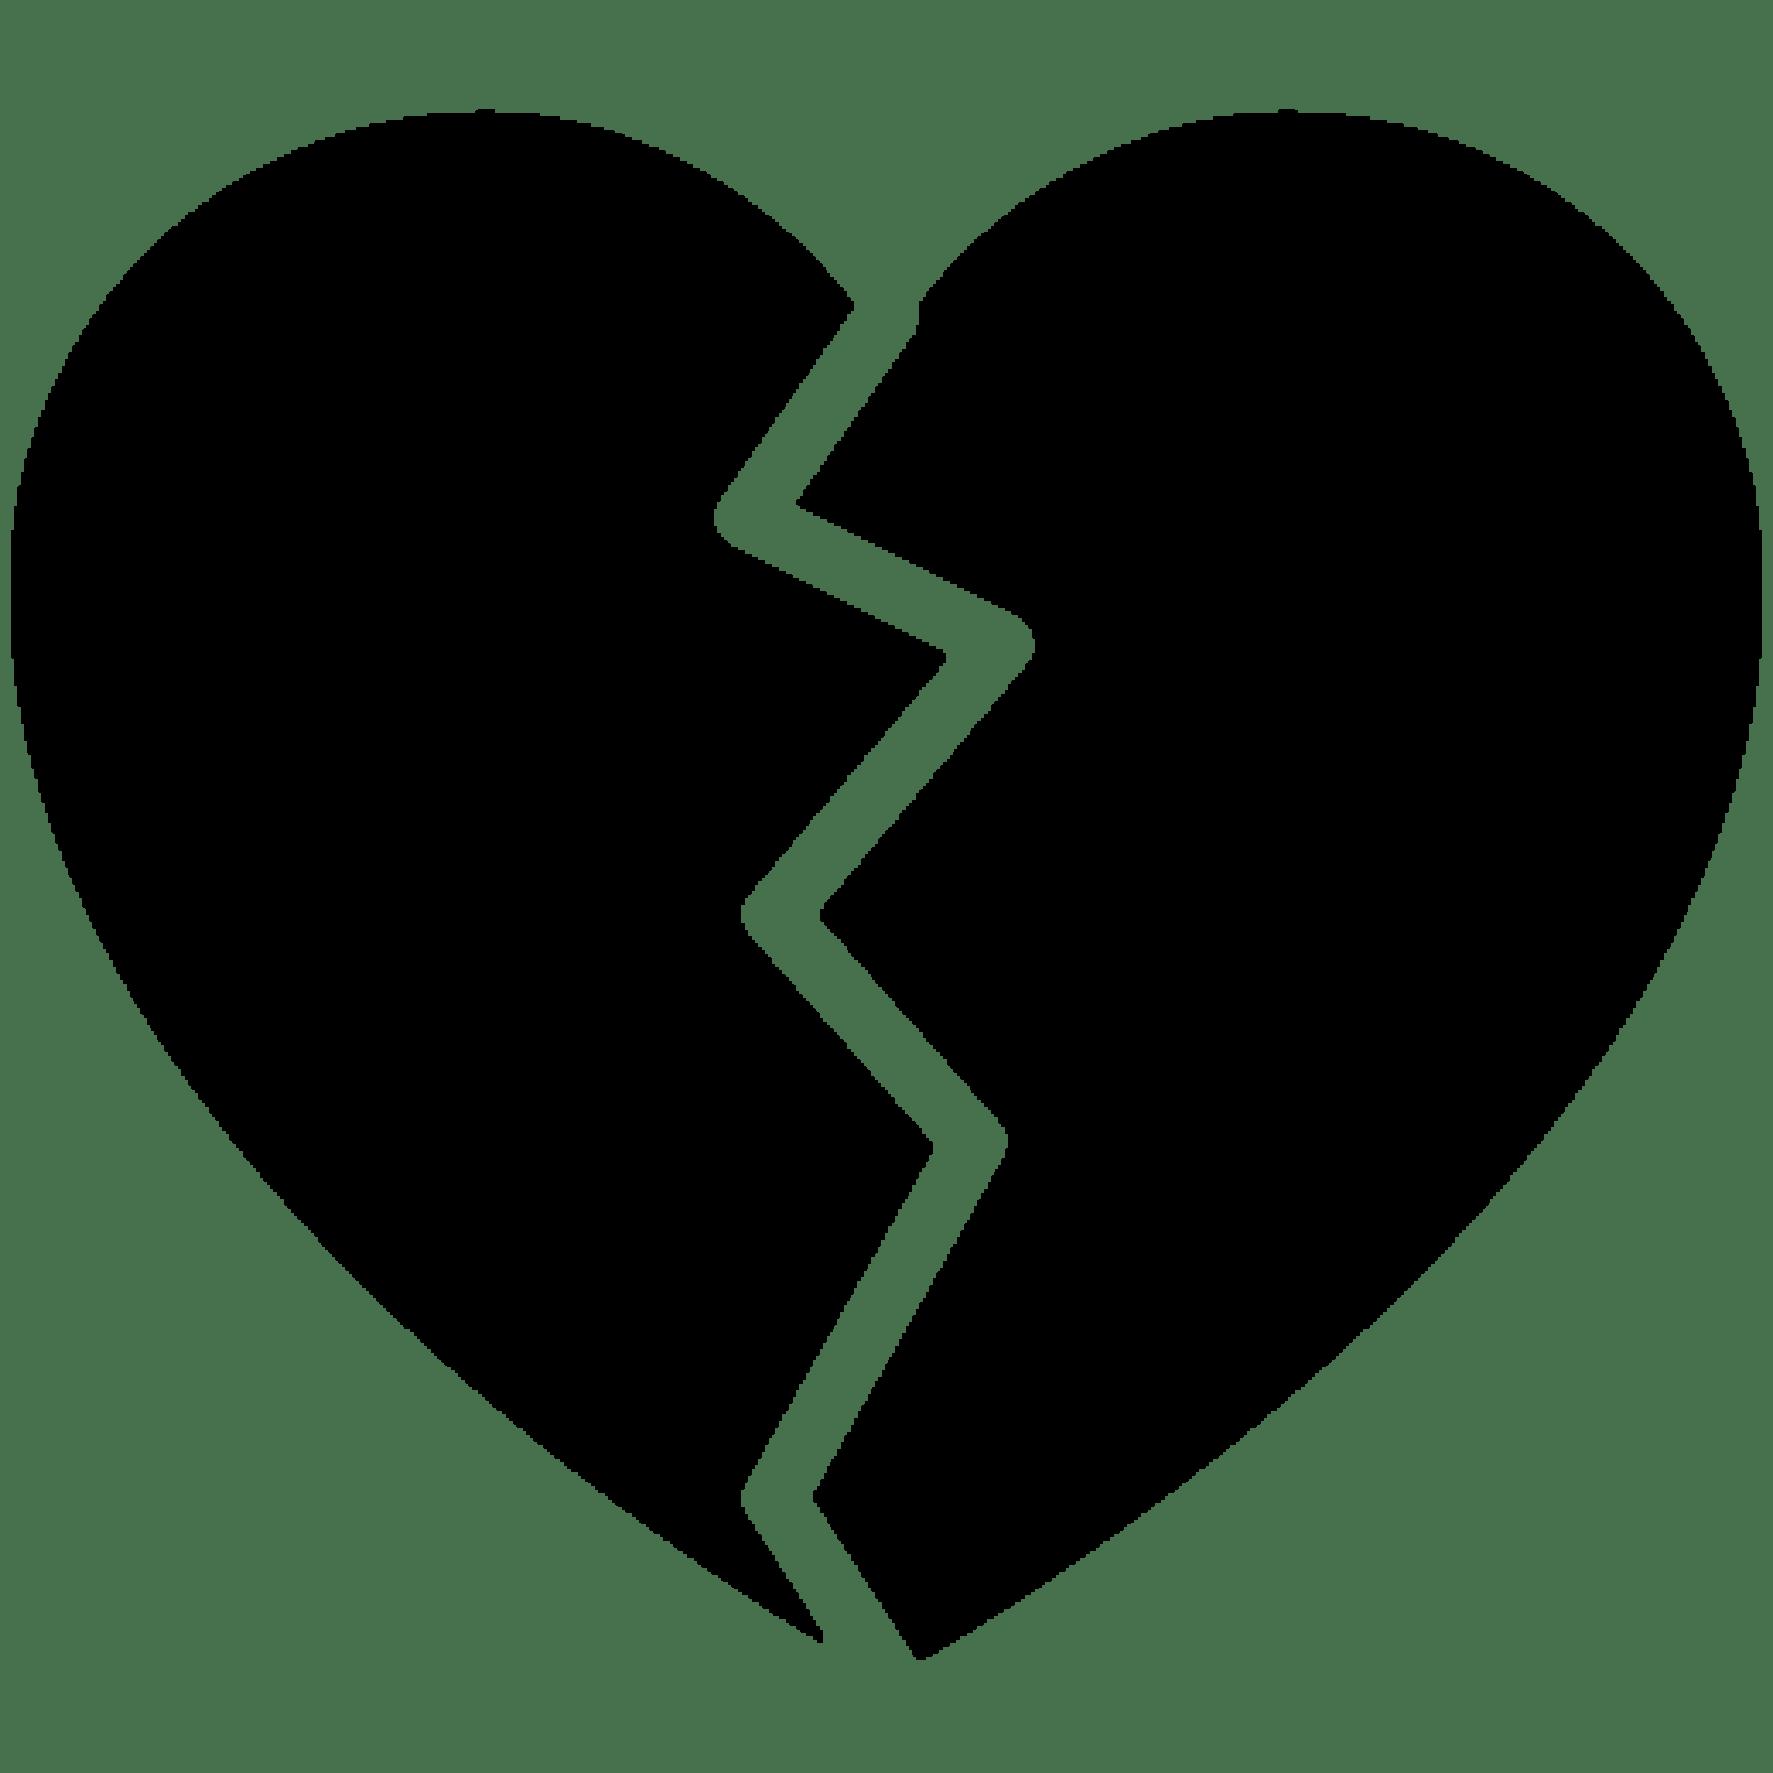 hight resolution of  lil peep tatoo broken heart black